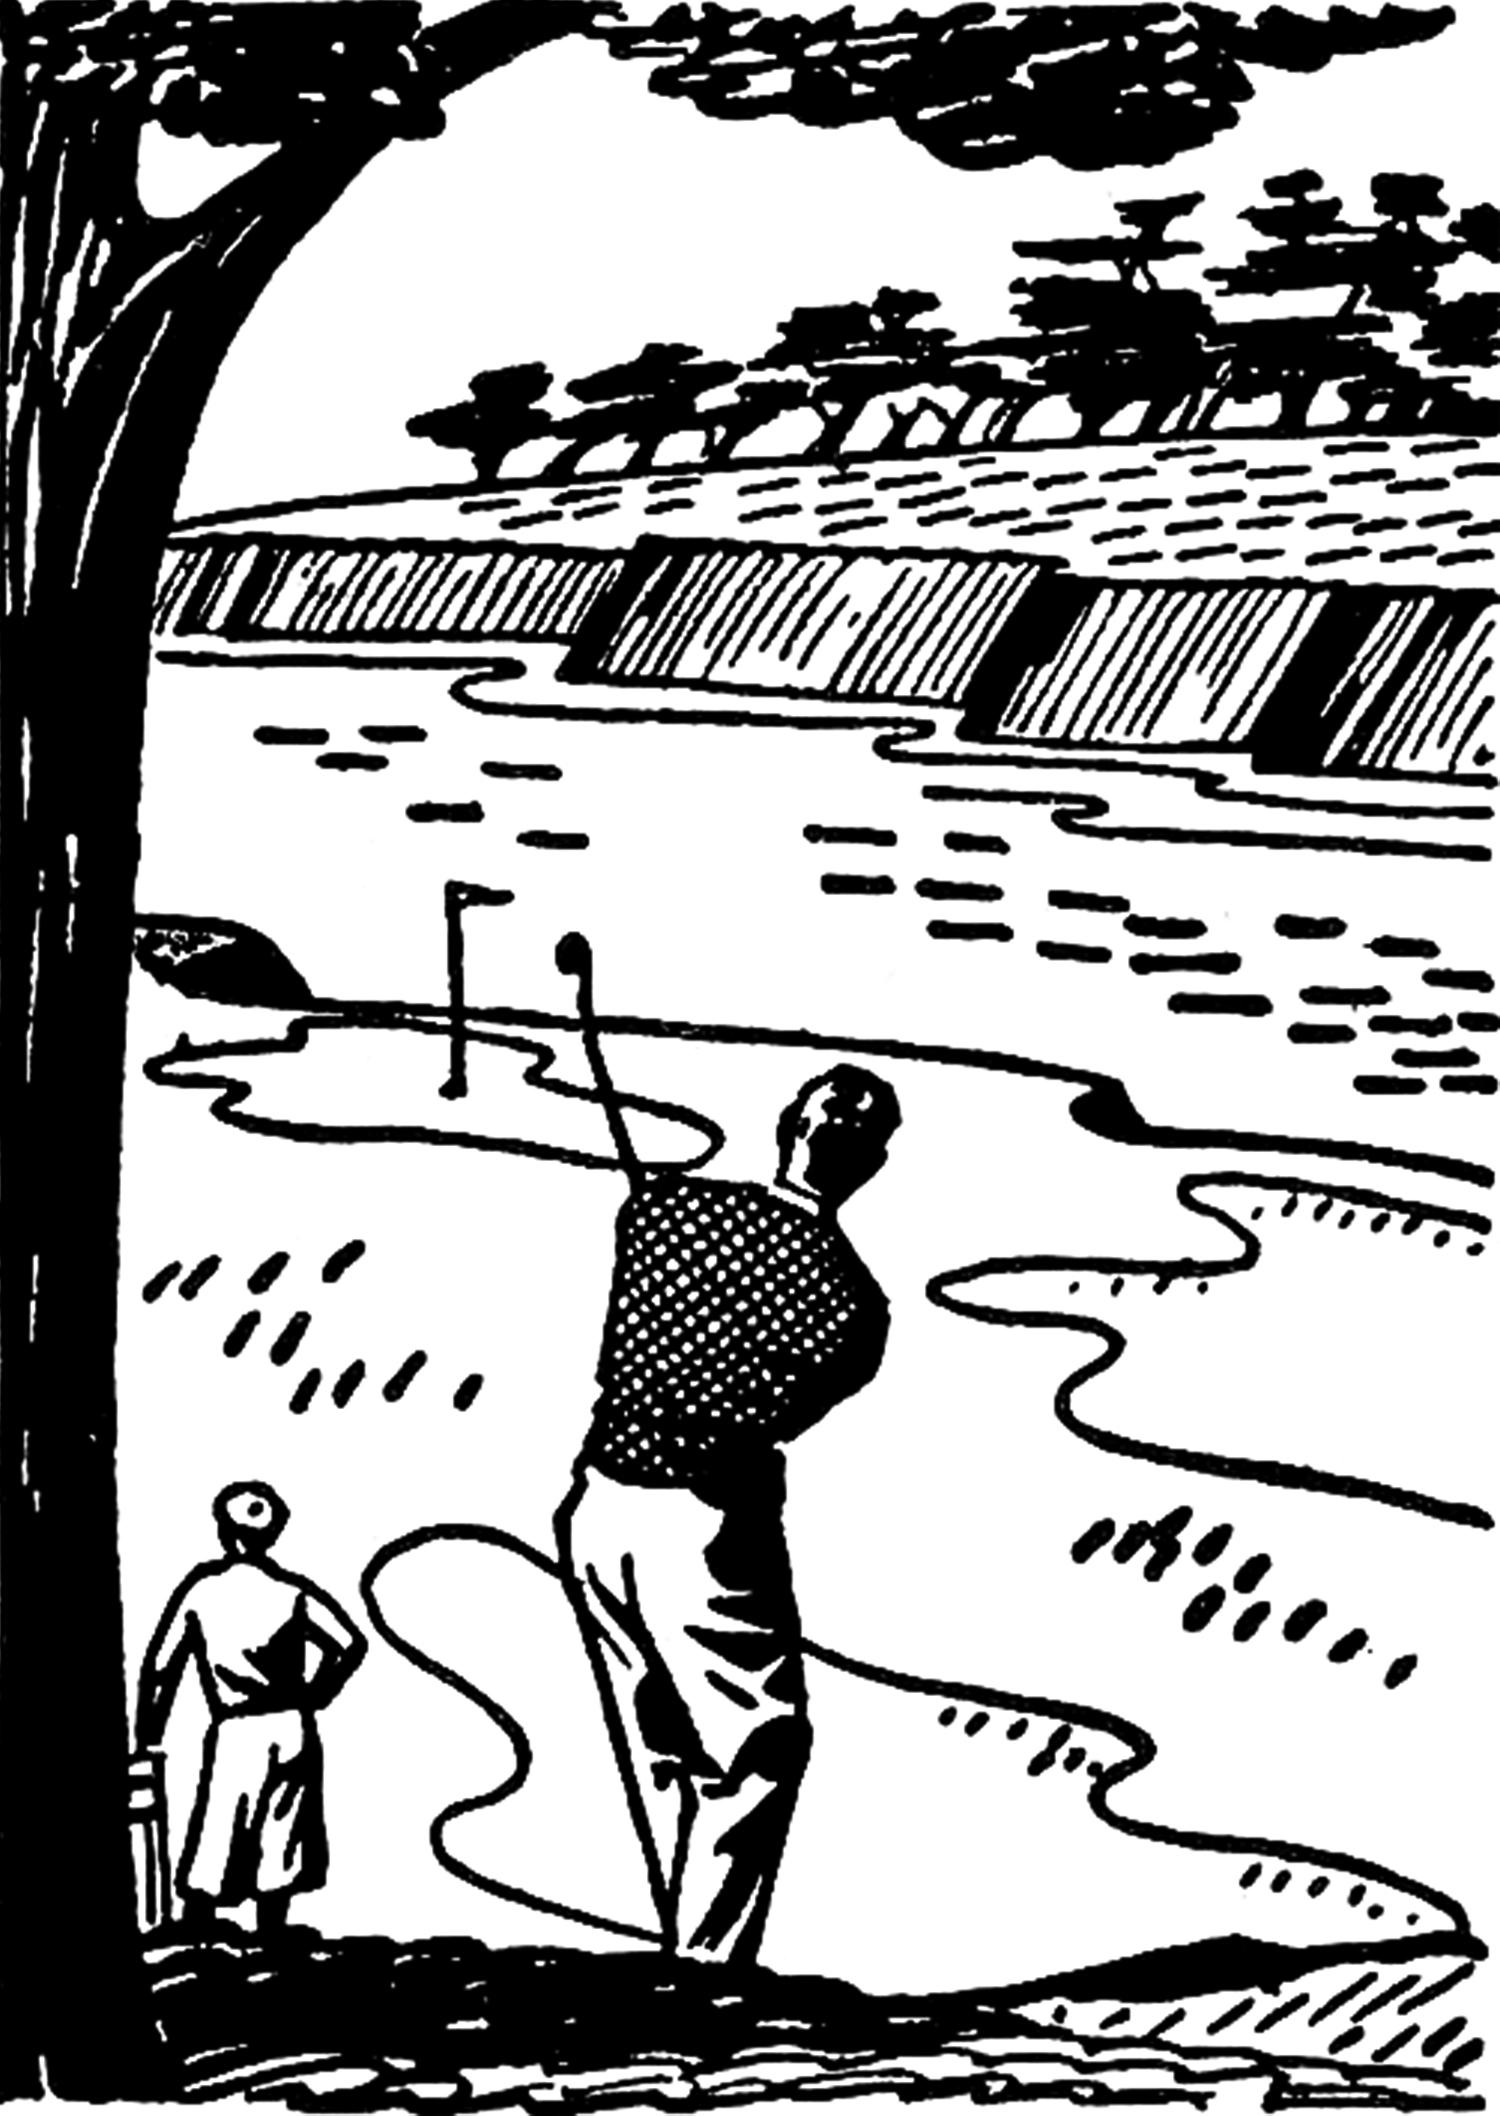 Golfer clipart black and white. Retro golf images clip